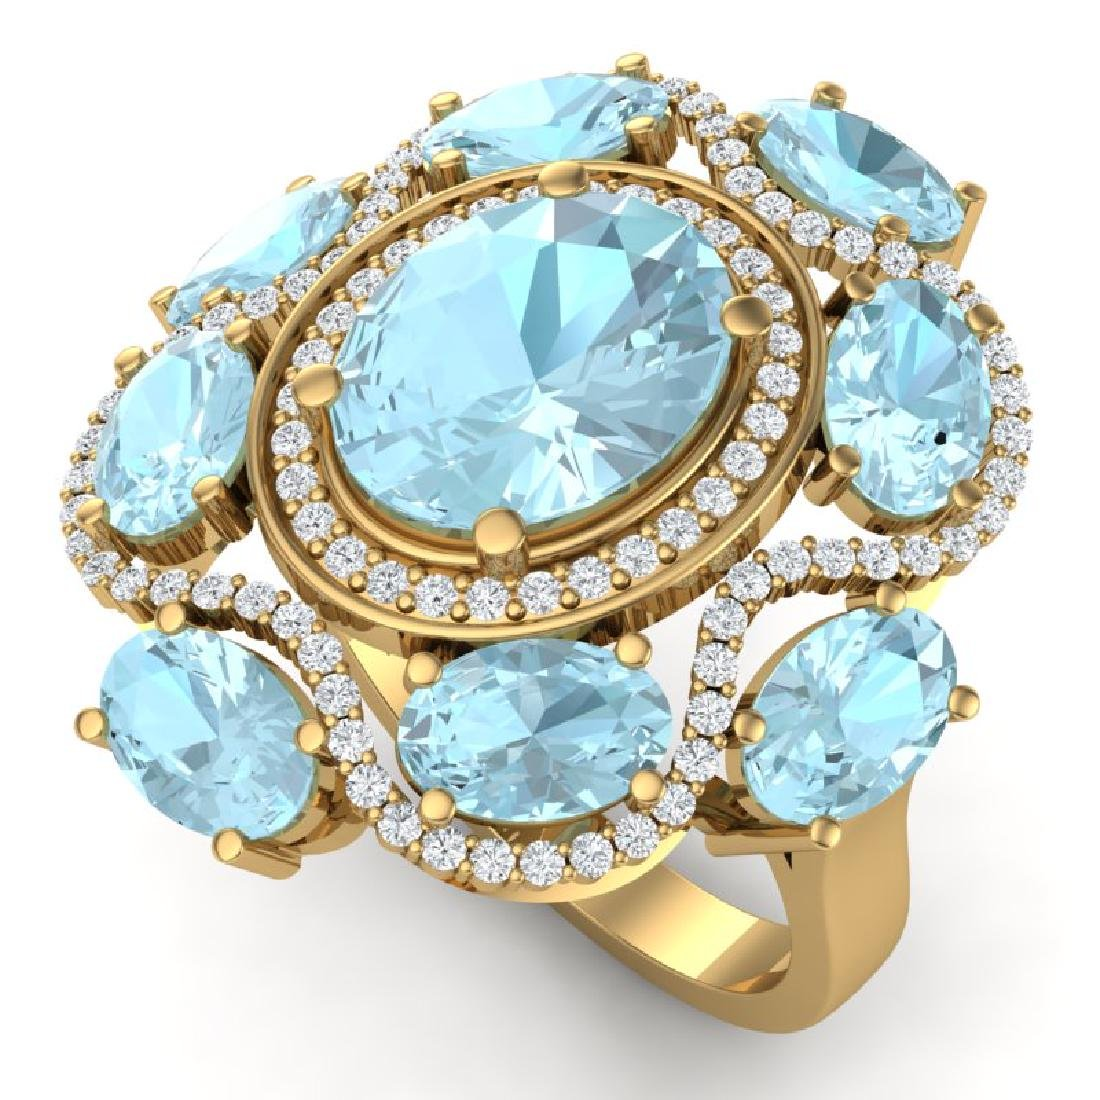 9.26 CTW Royalty Sky Topaz & VS Diamond Ring 18K Yellow